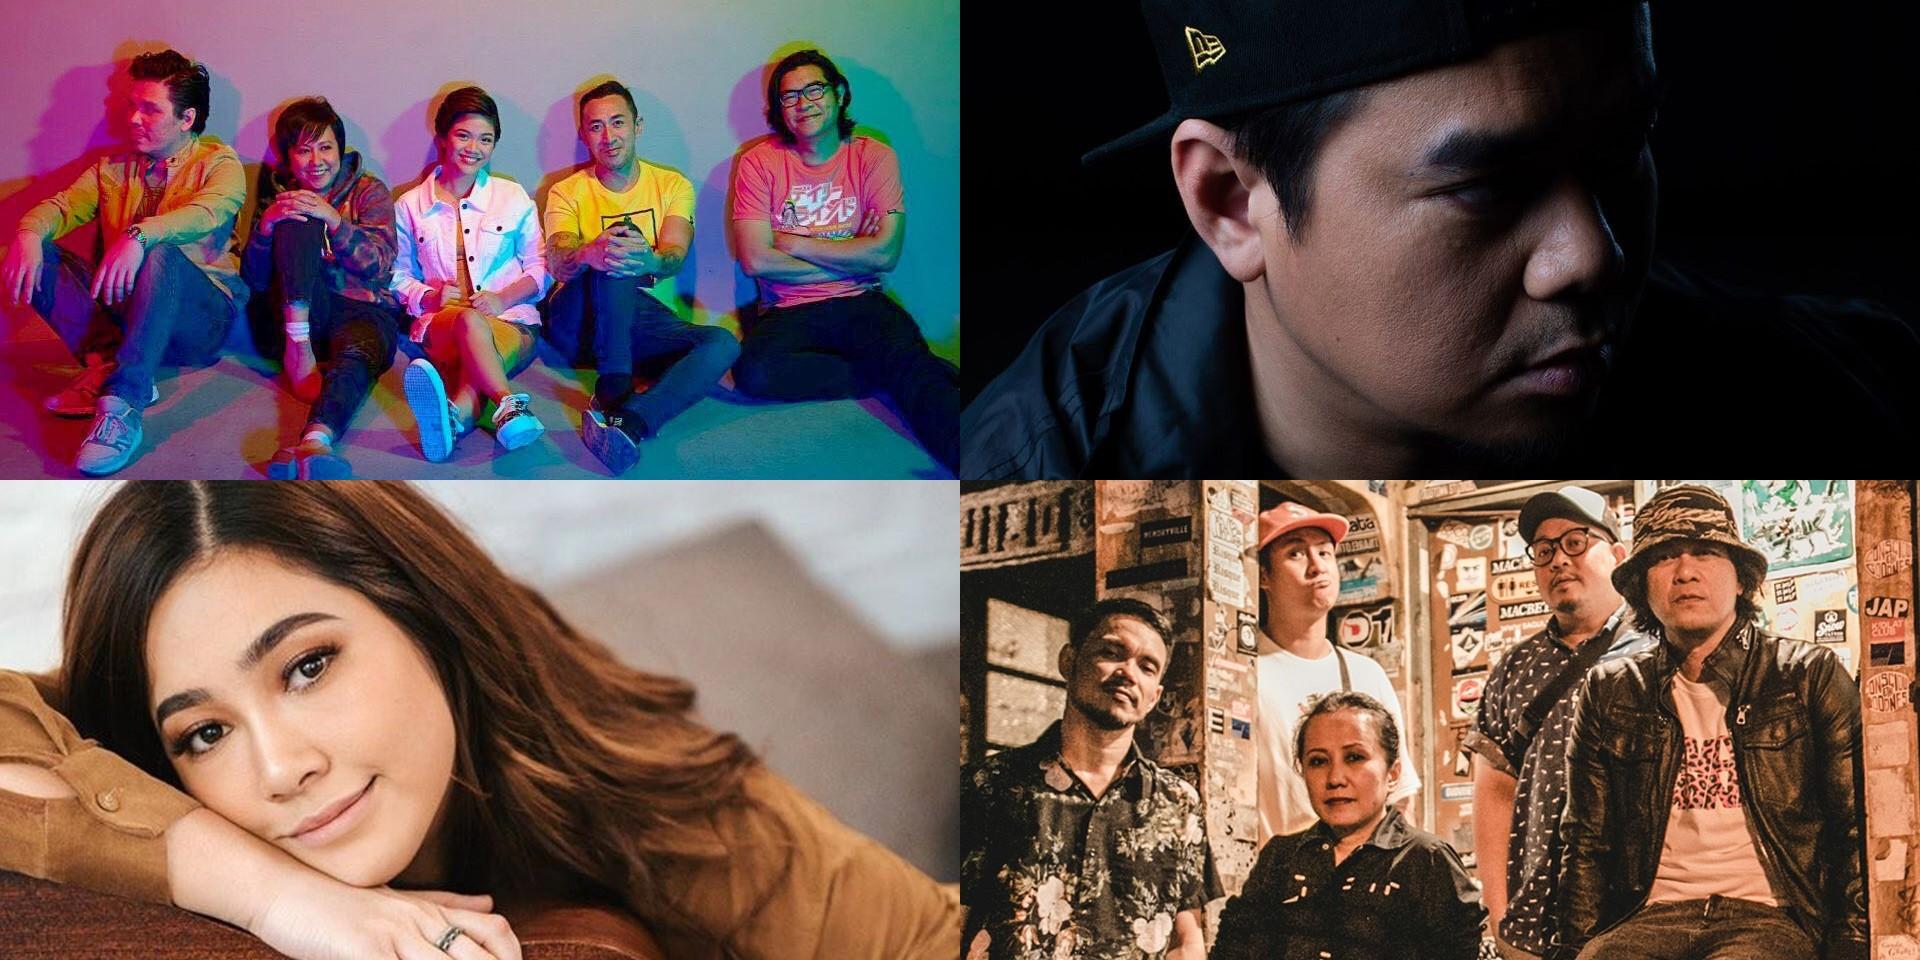 Imago, Sandwich, Gloc-9, Moira Dela Torre, and more release new music – listen